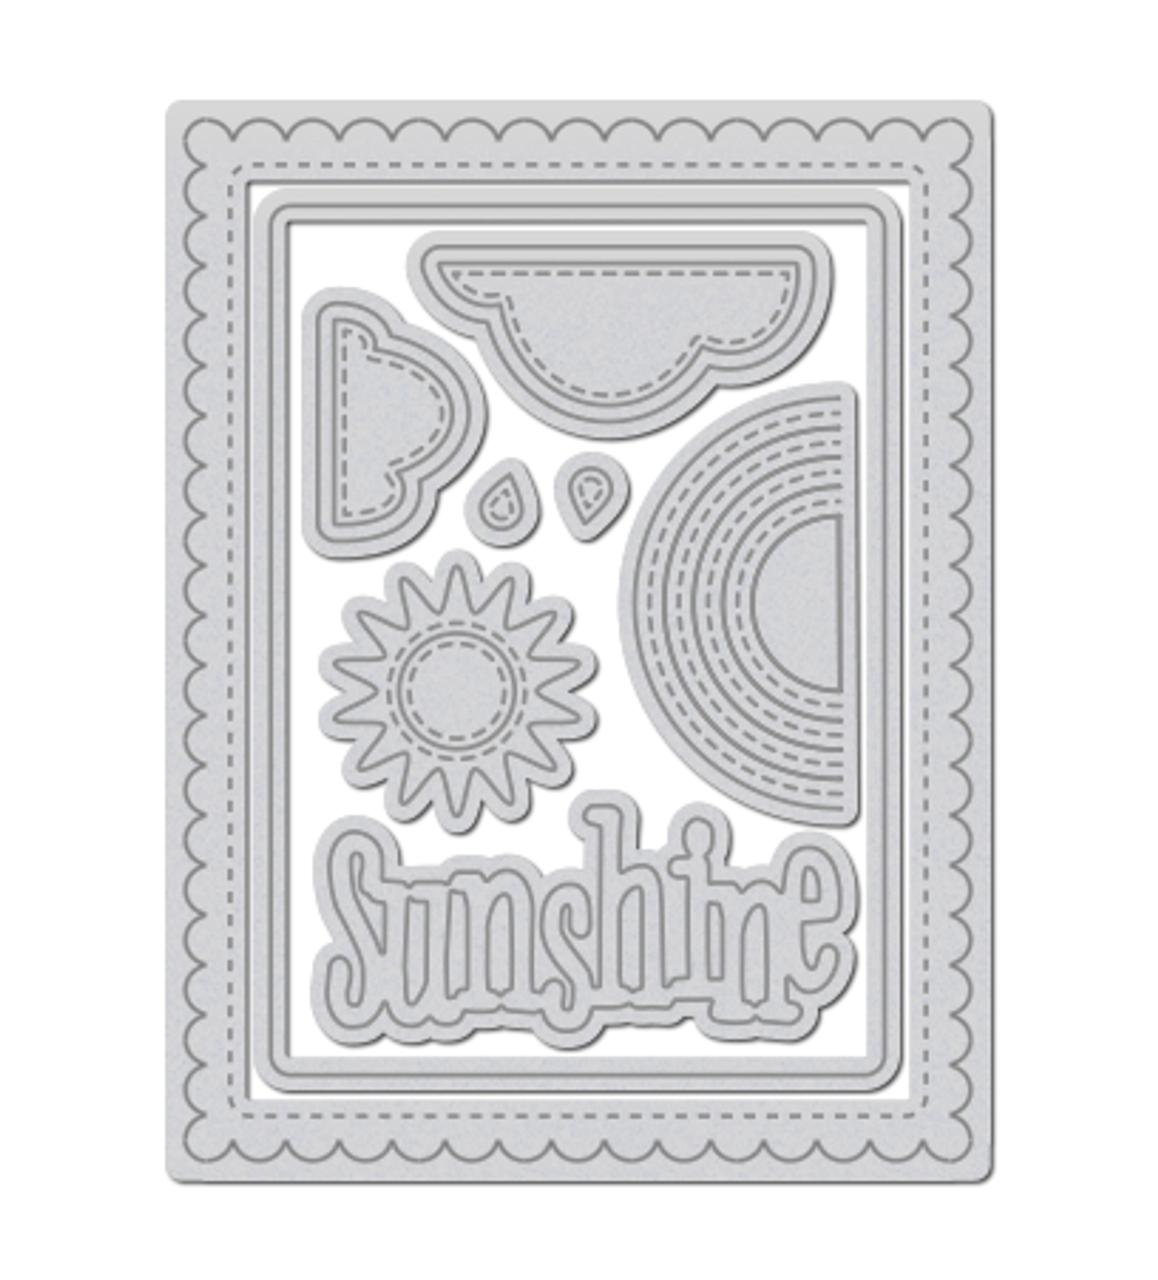 WPlus9 Sunshine Layers Die